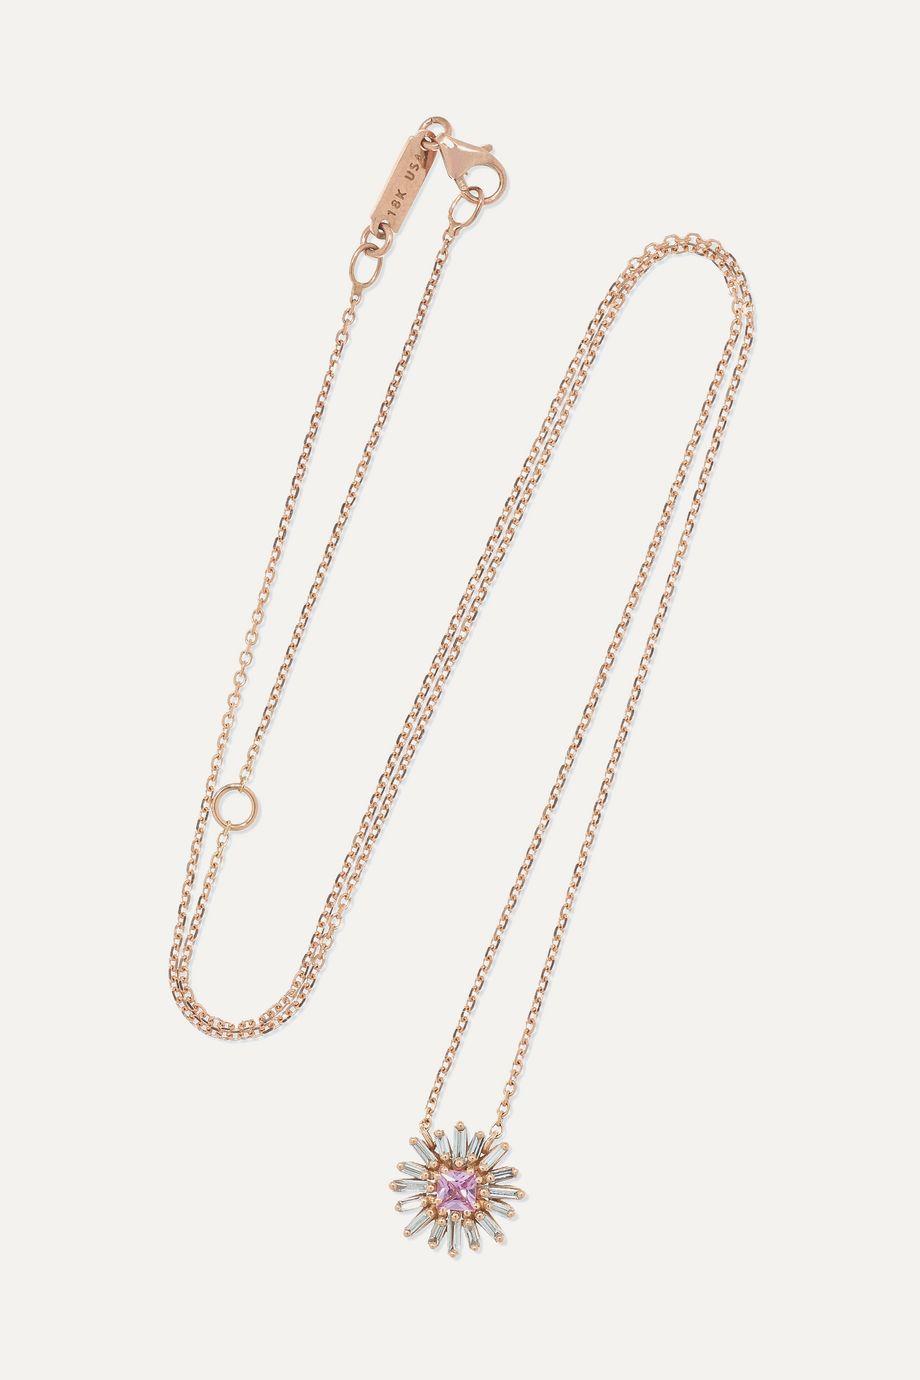 Suzanne Kalan 18-karat rose gold, diamond and sapphire necklace